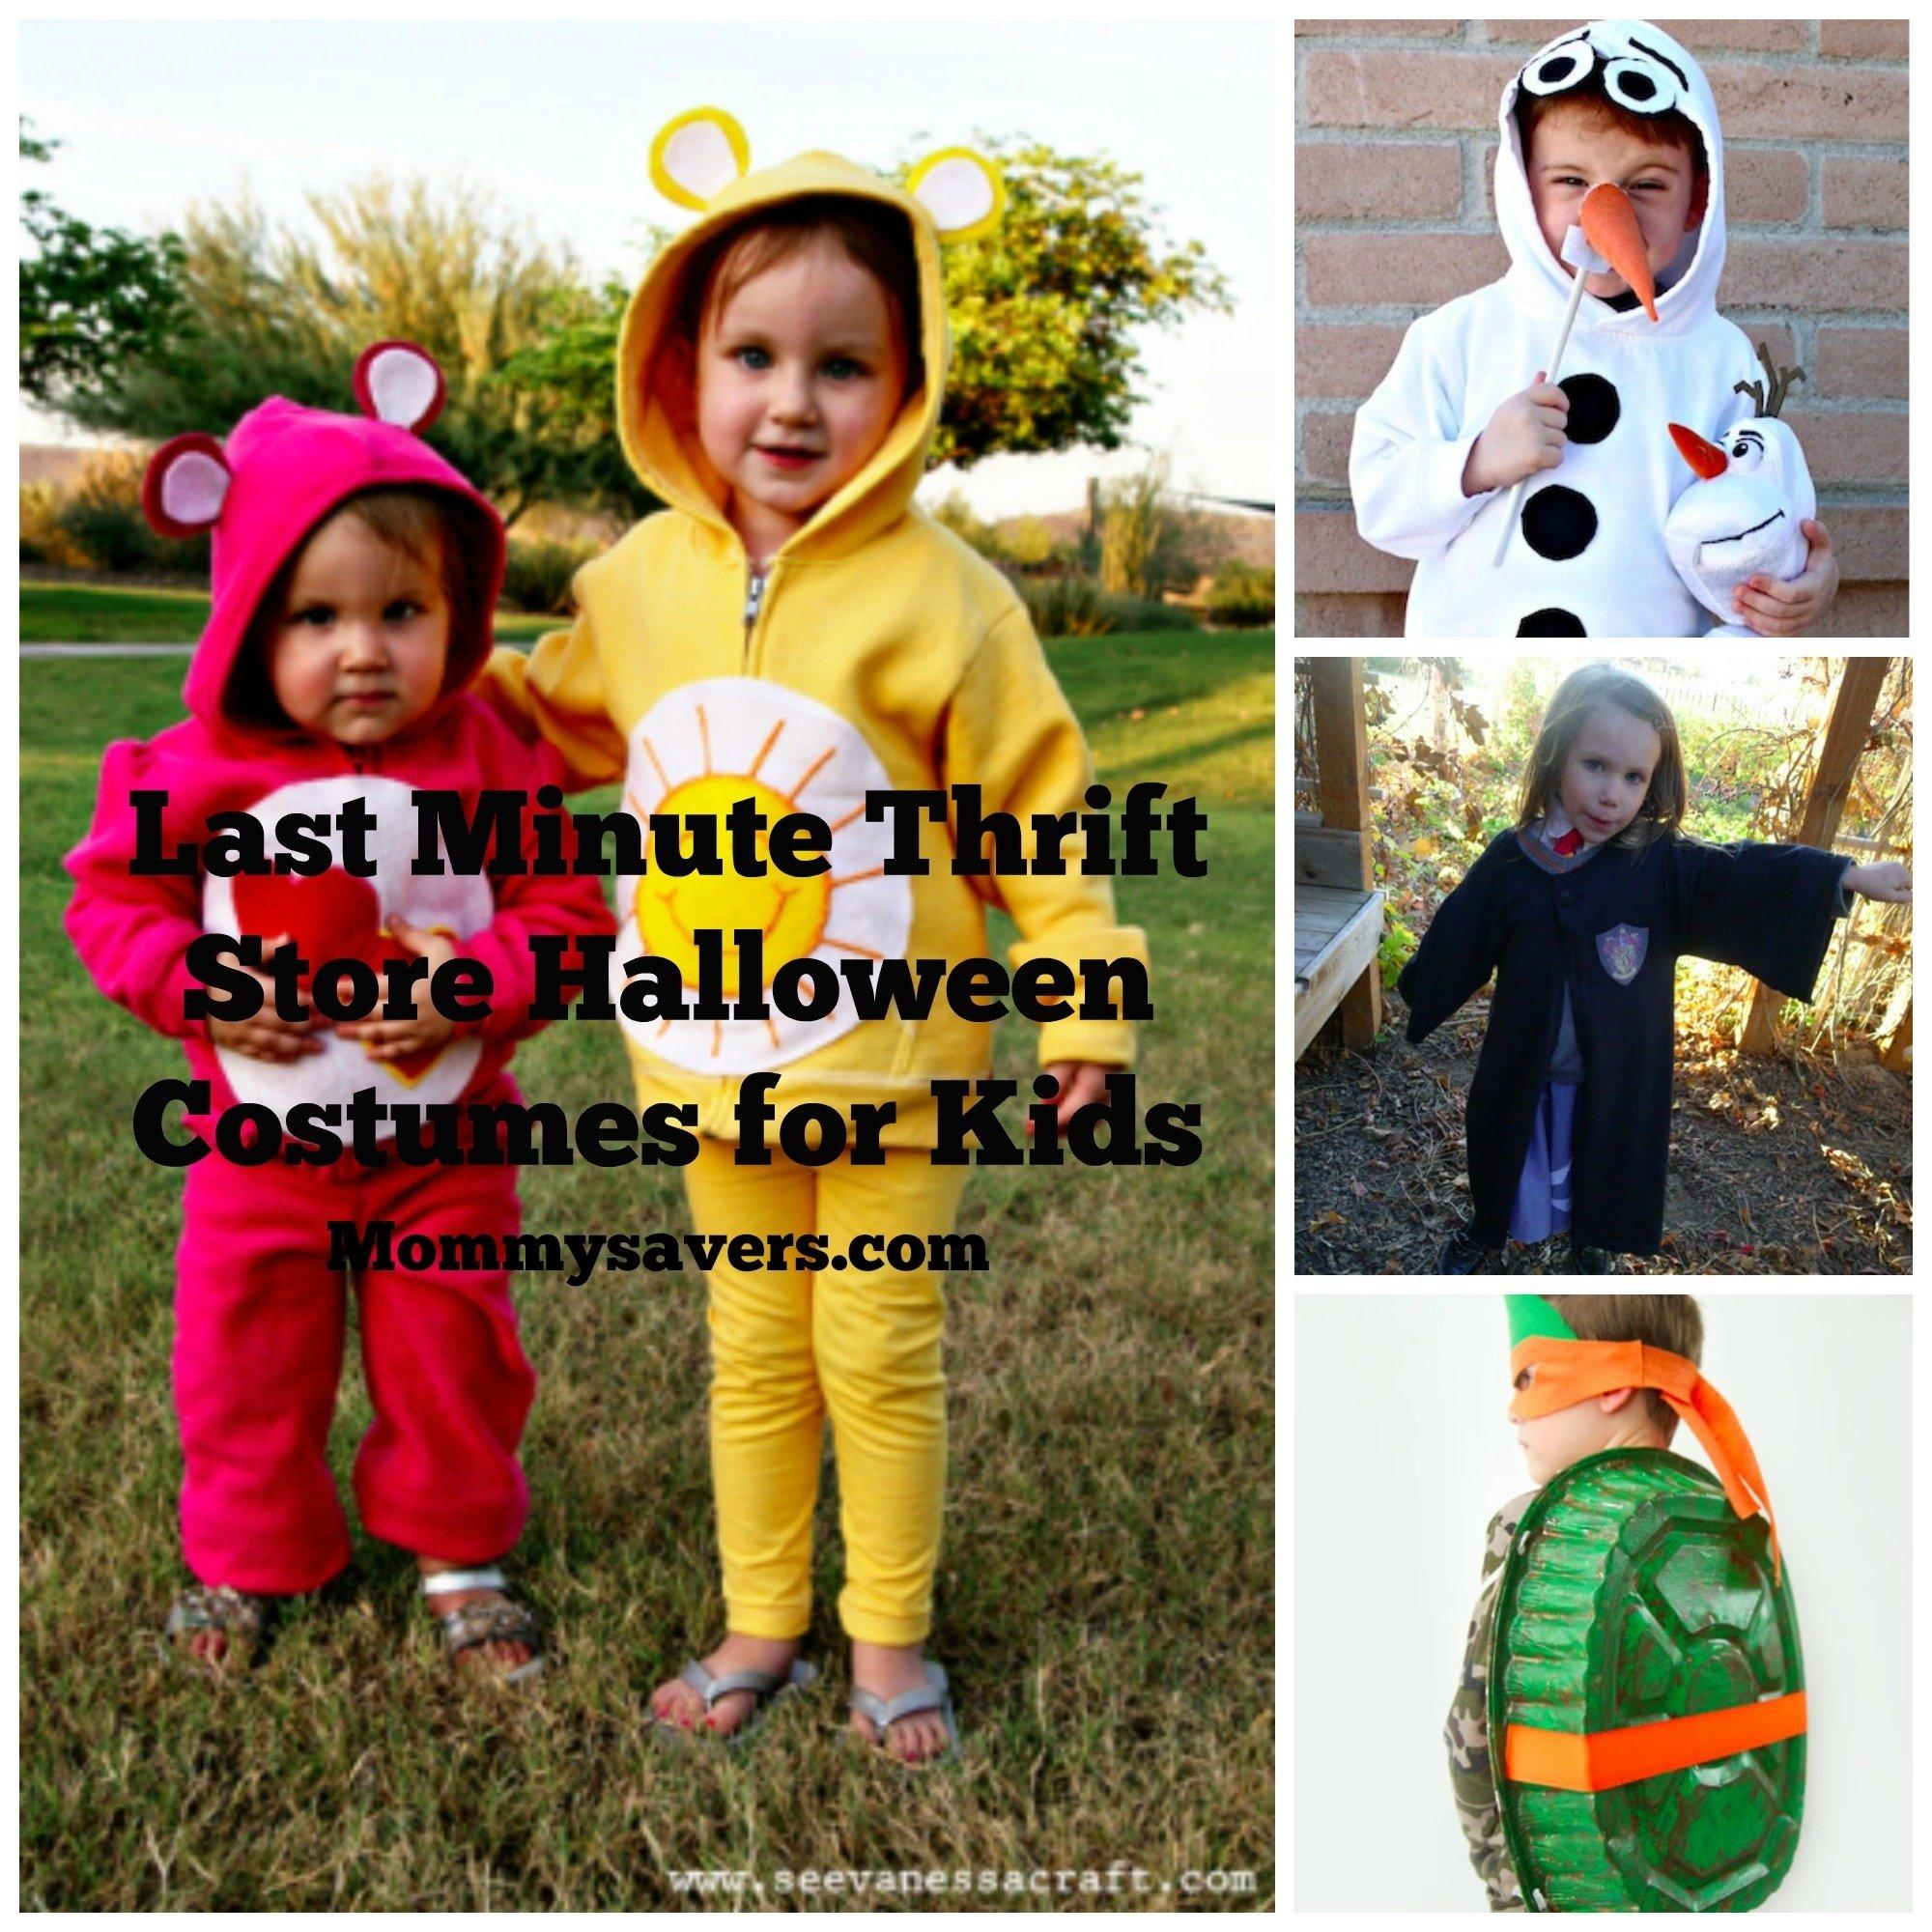 10 Lovely Thrift Store Halloween Costume Ideas last minute thrift store halloween costumes for kids mommysavers 1 2020